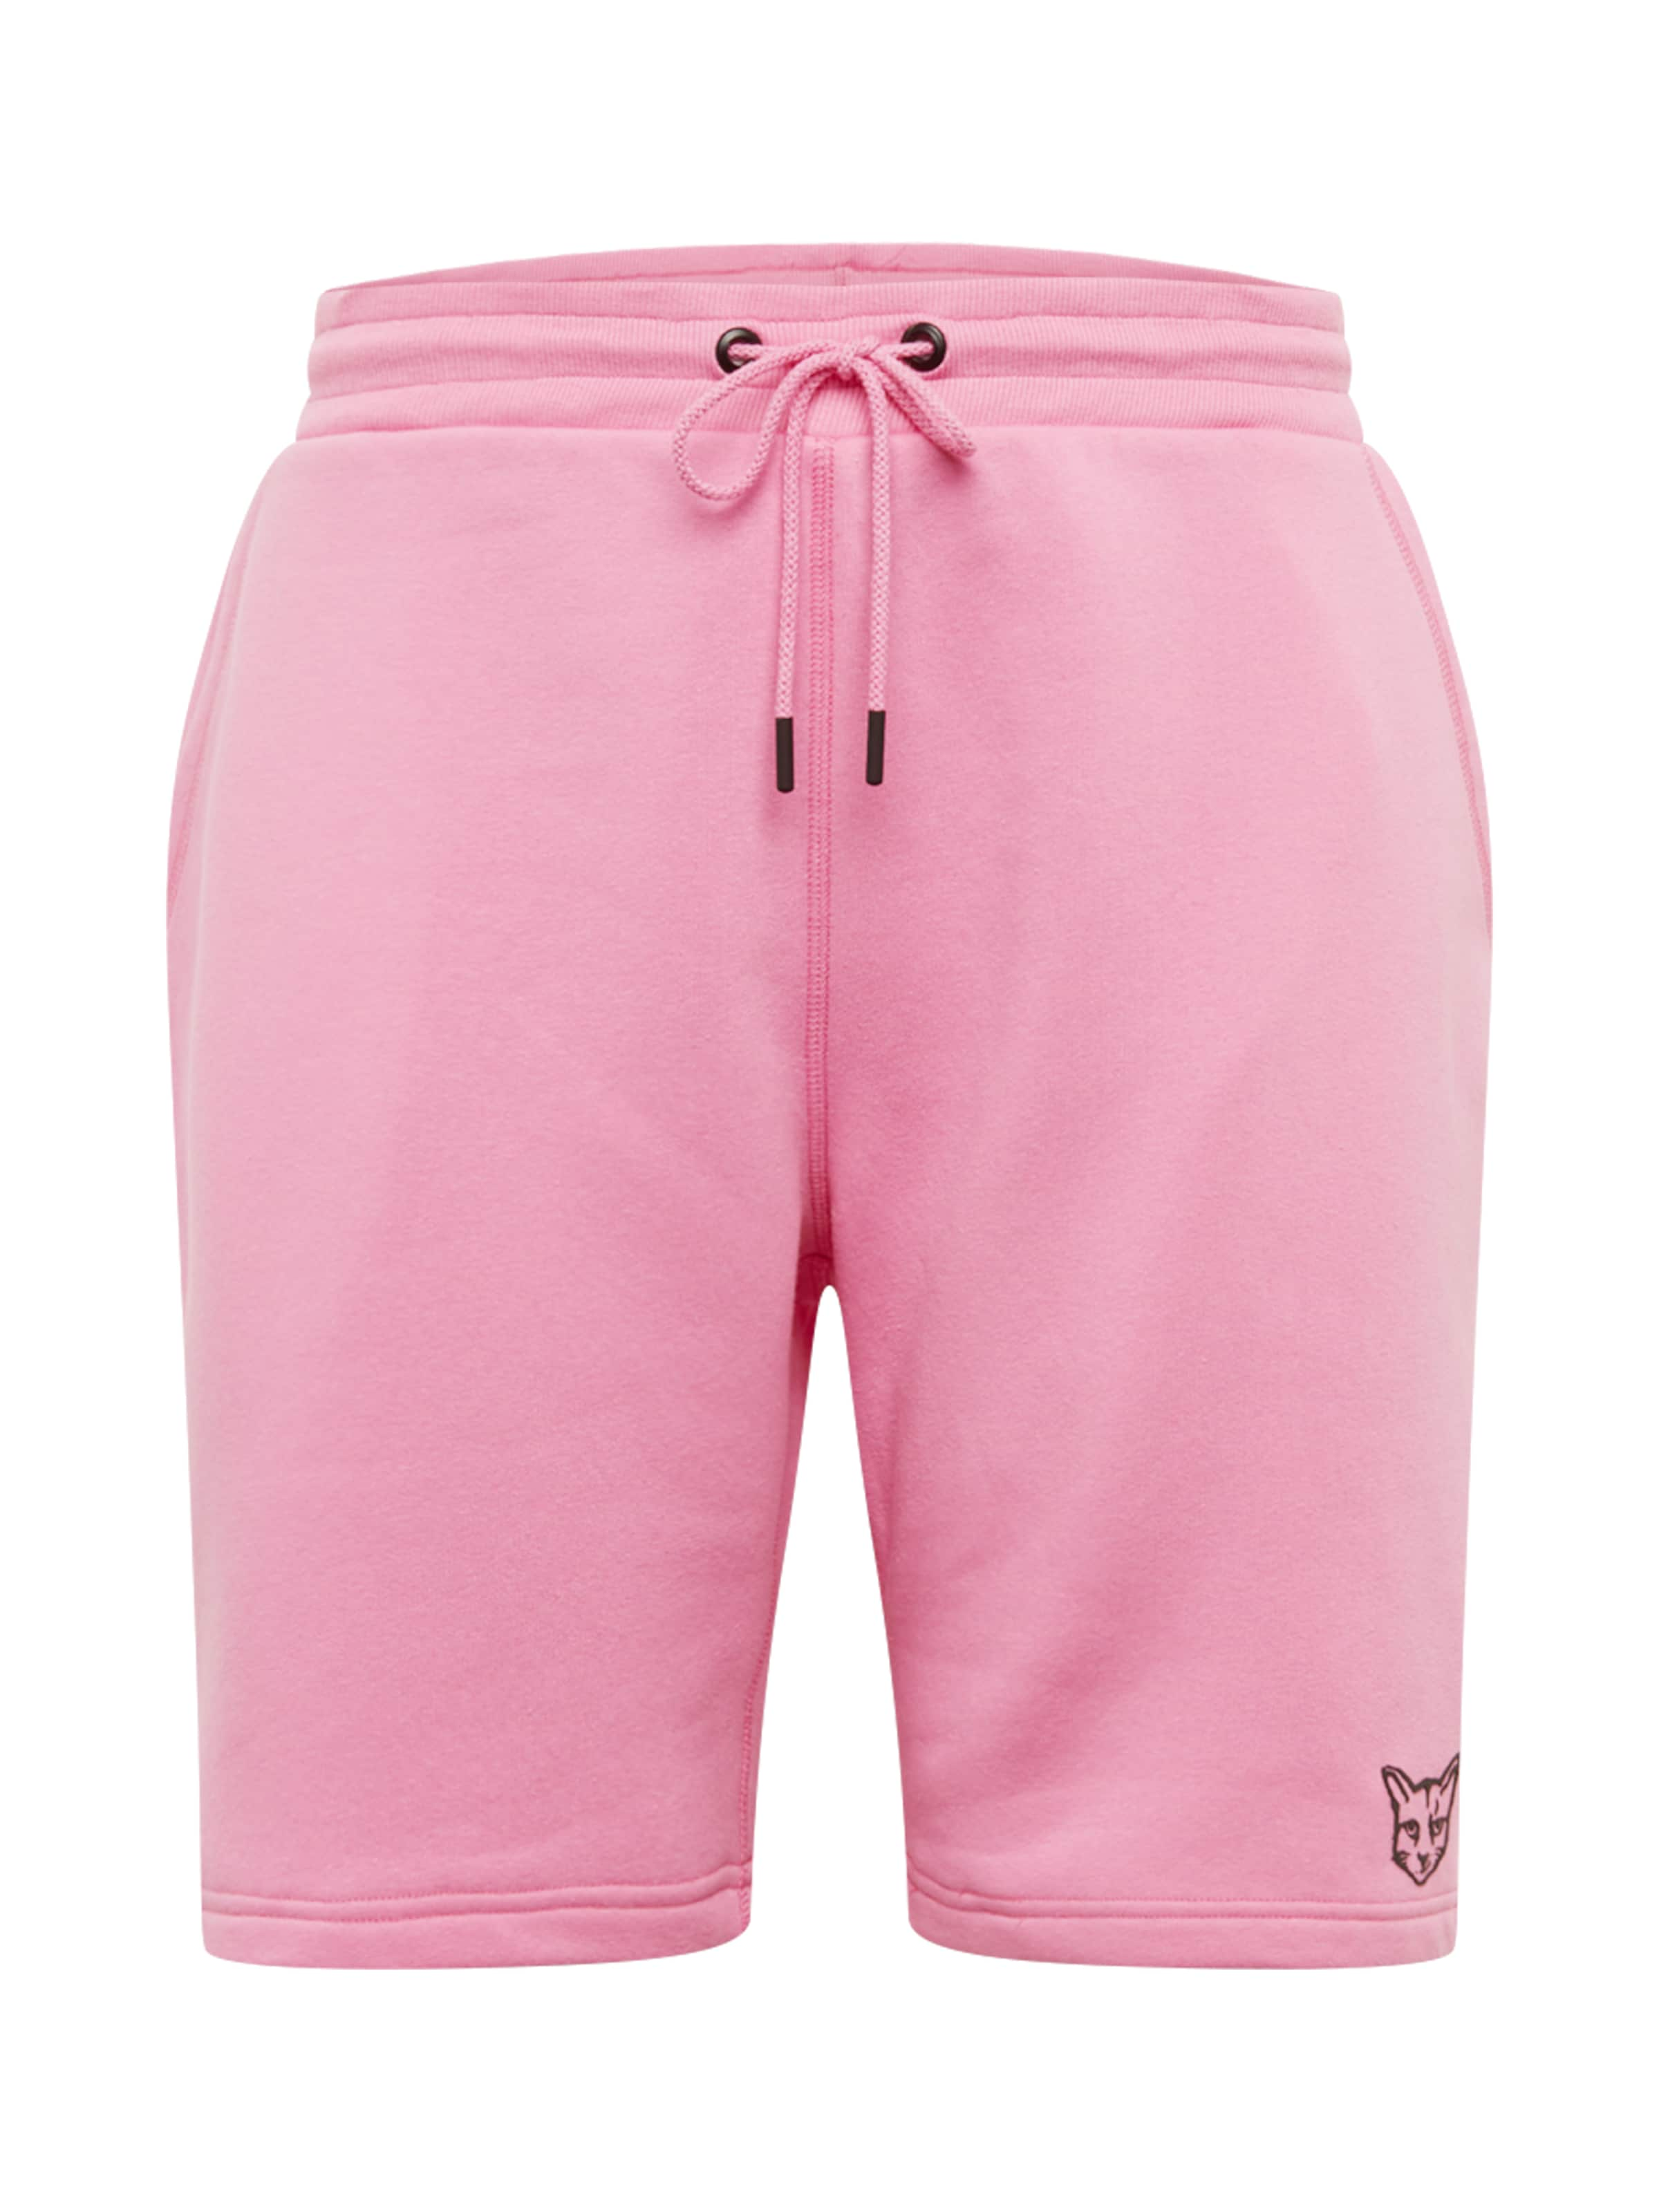 'linus' About You Pari Pantalon X Rose En lJK1F3cT